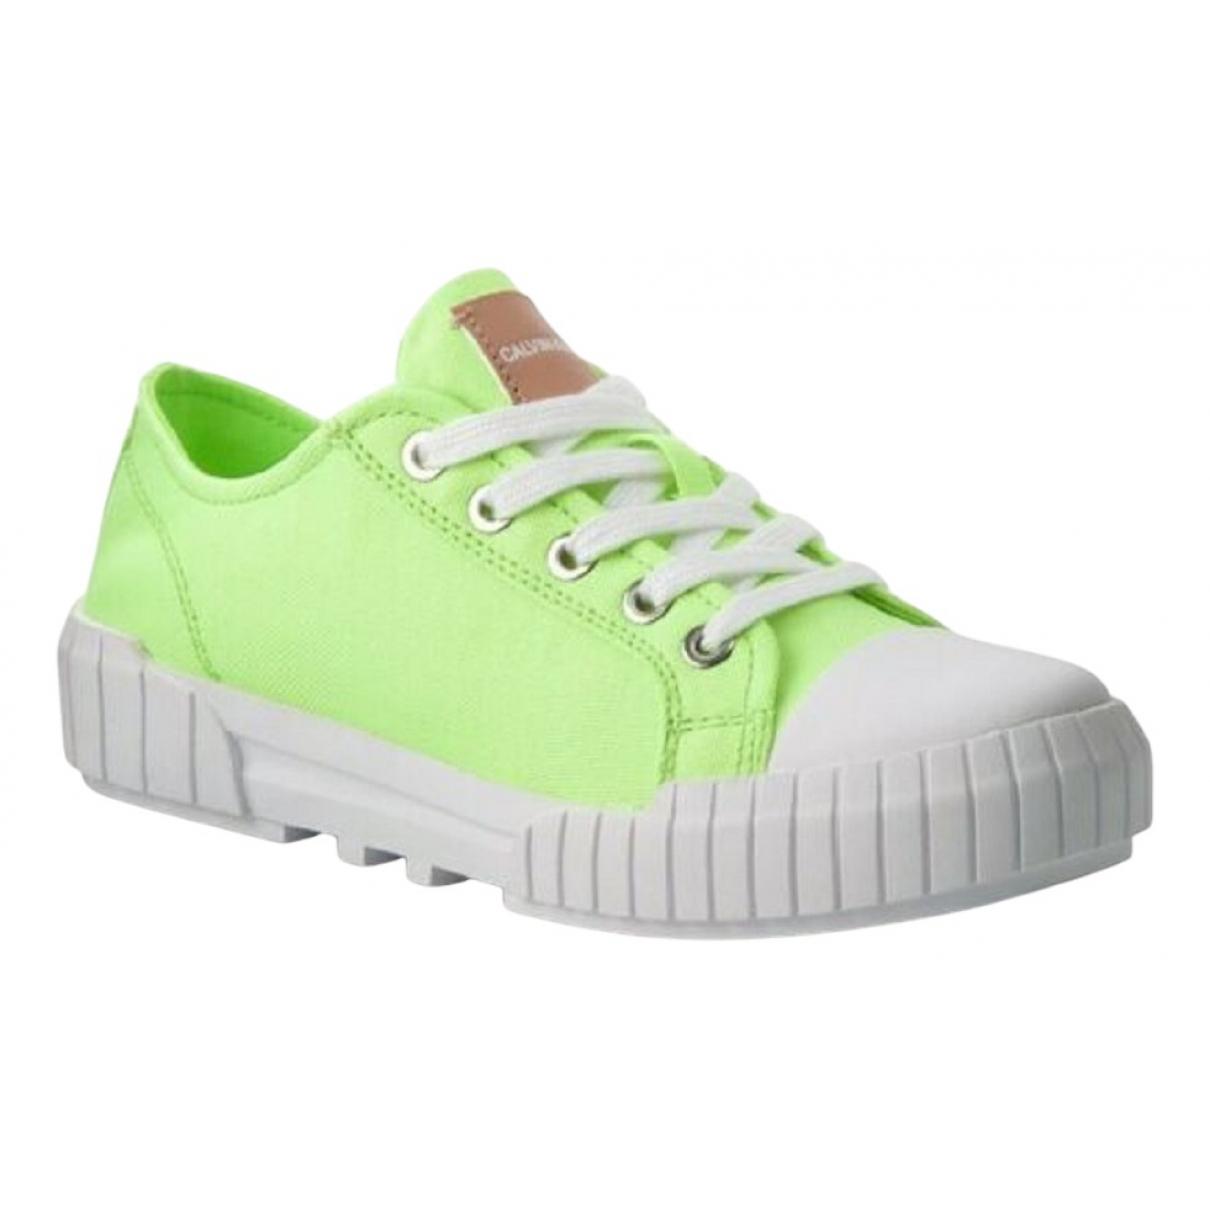 Calvin Klein \N Sneakers in  Gruen Leinen